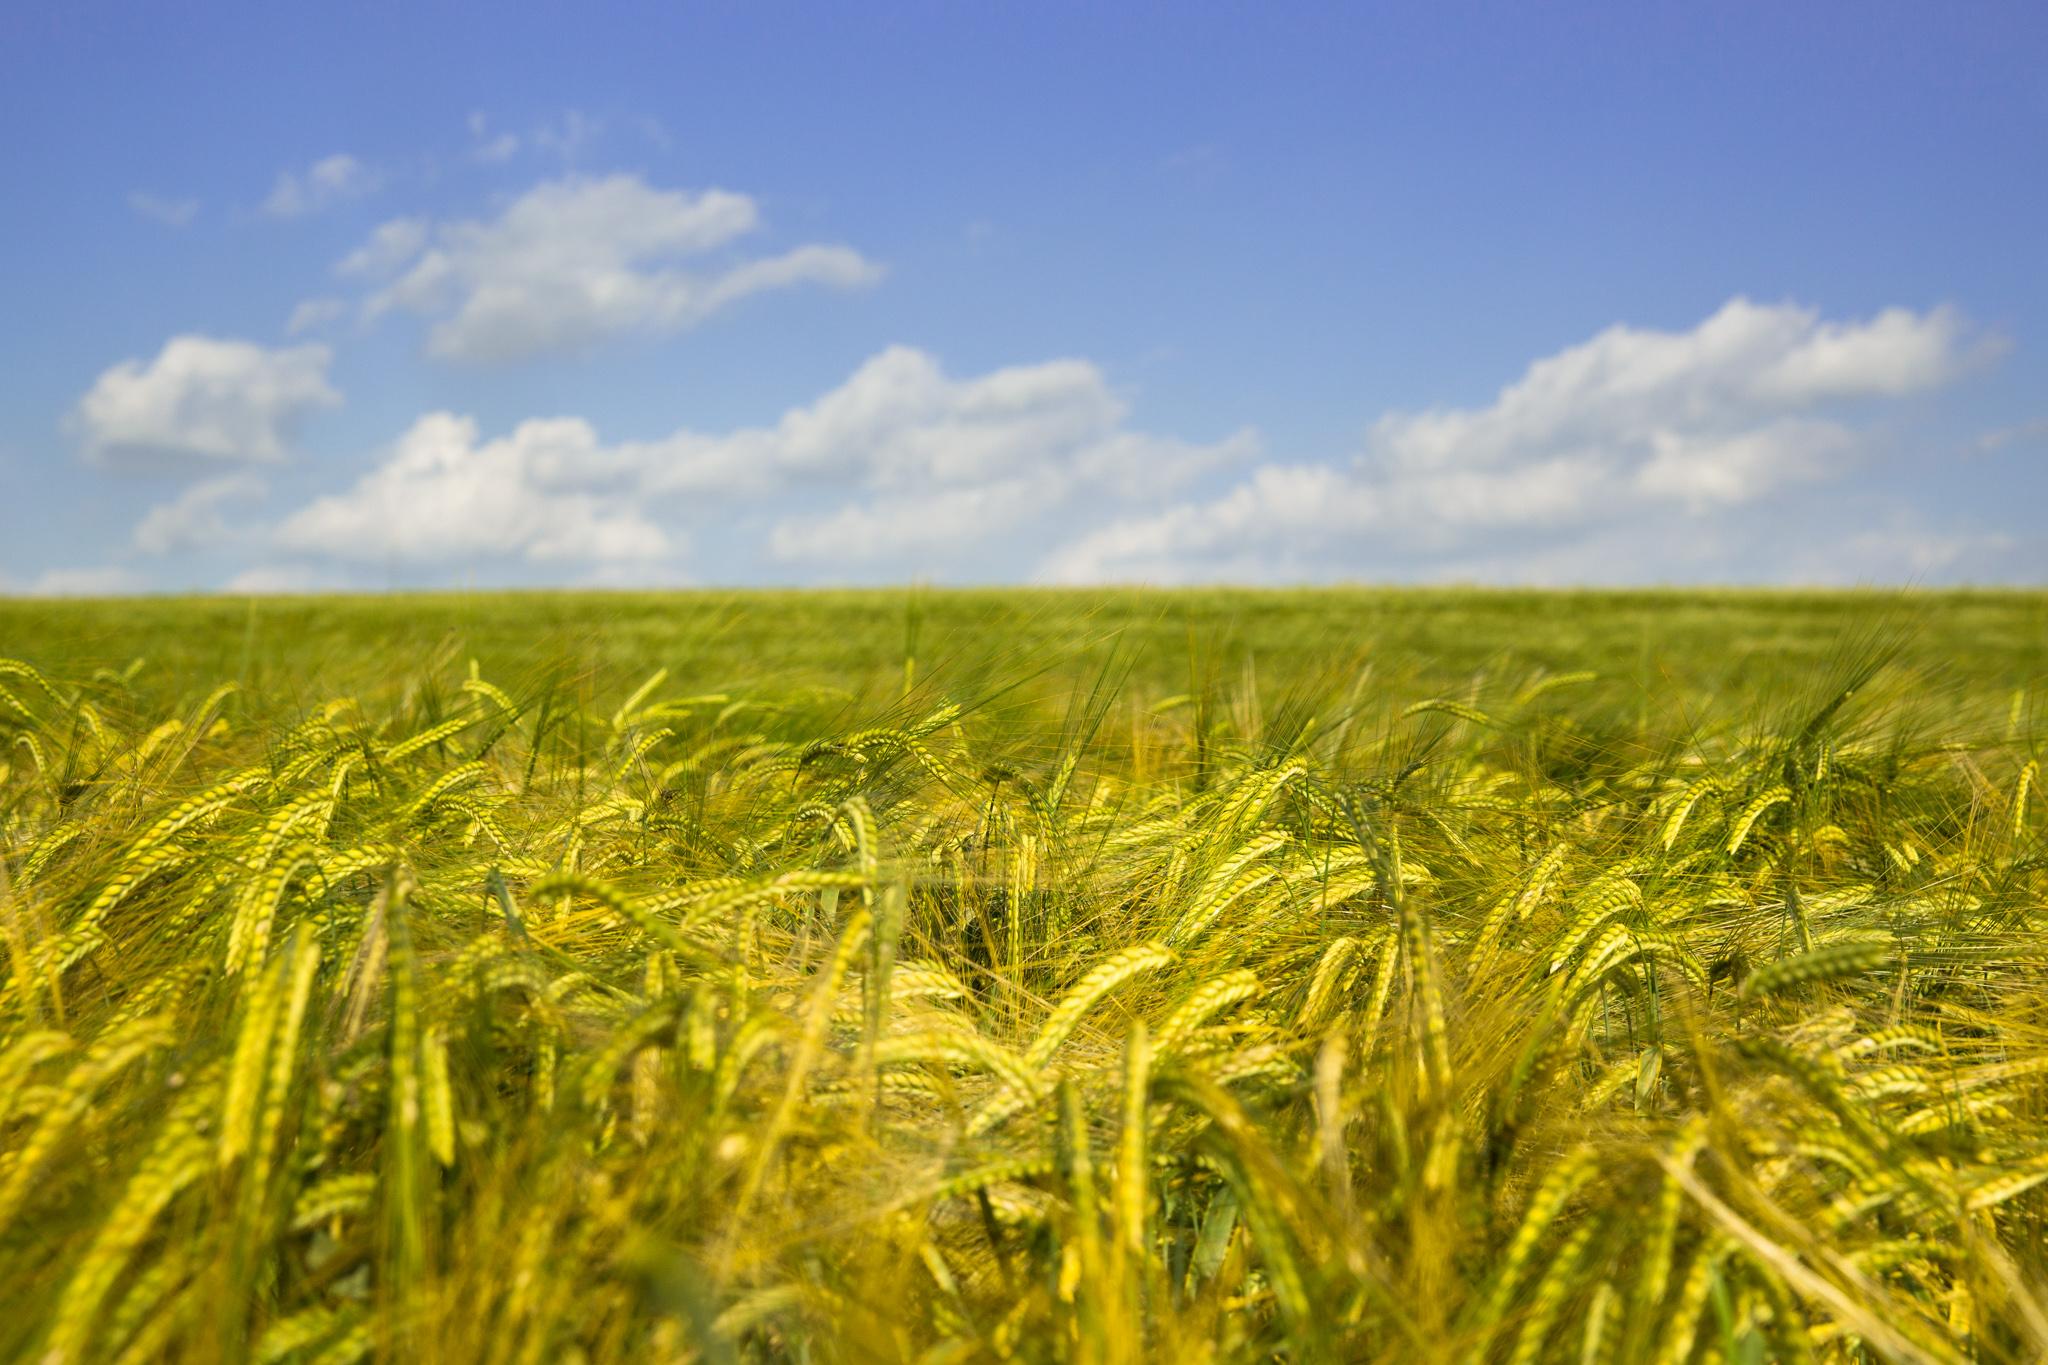 7508-uk-award-winning-landscape-photography.jpg